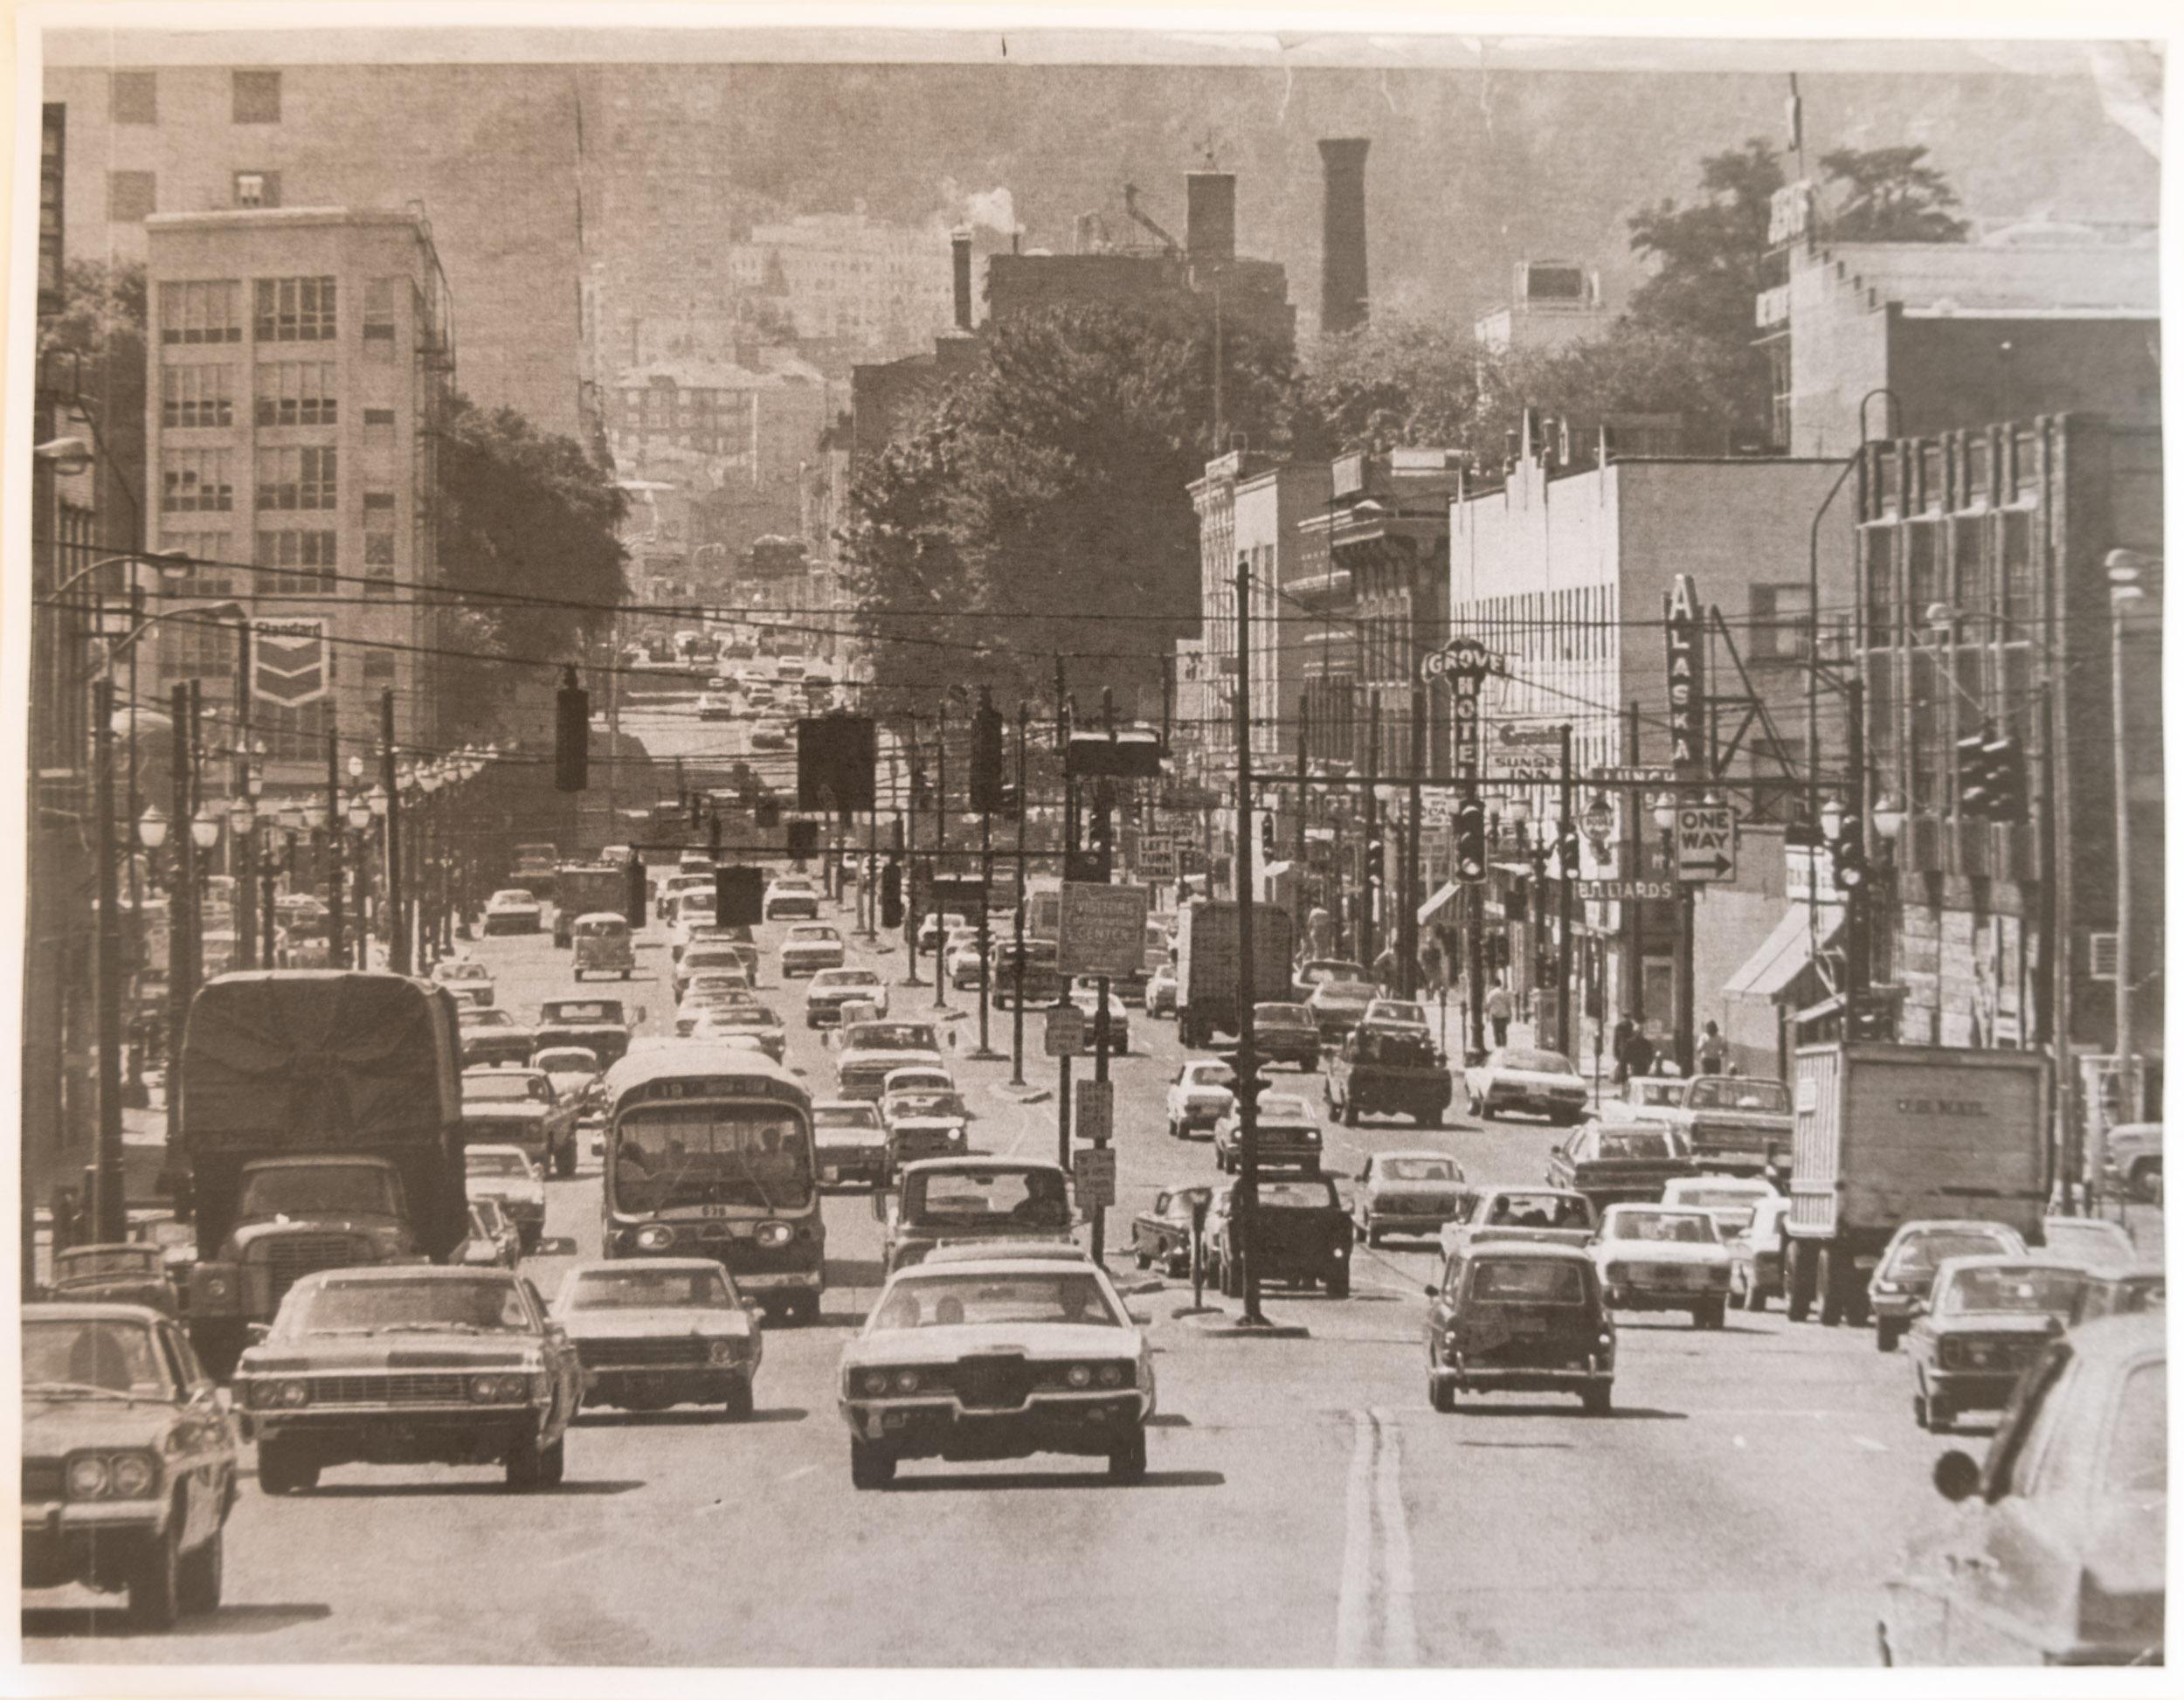 Scene from downtown Burnside Street, 1974